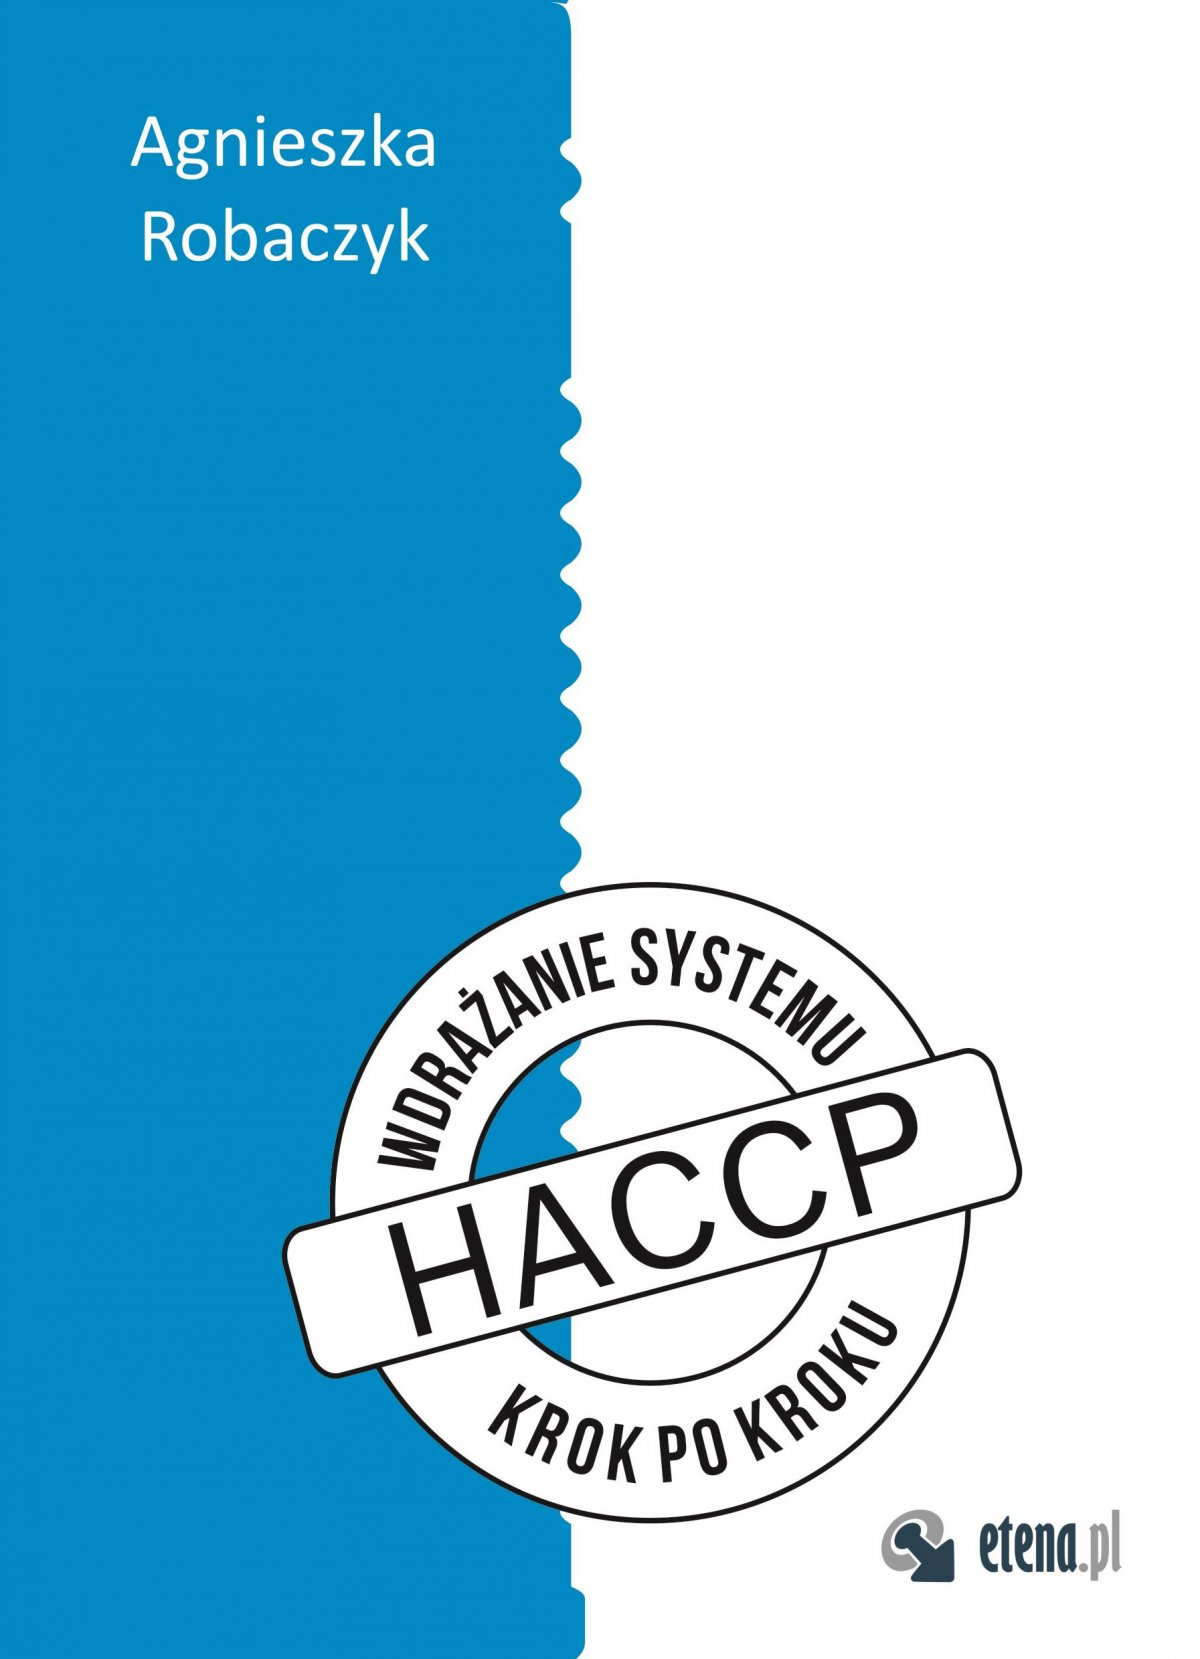 "Wdrażanie systemu HACCP ""krok po kroku"" - Ebook (Książka na Kindle) do pobrania w formacie MOBI"